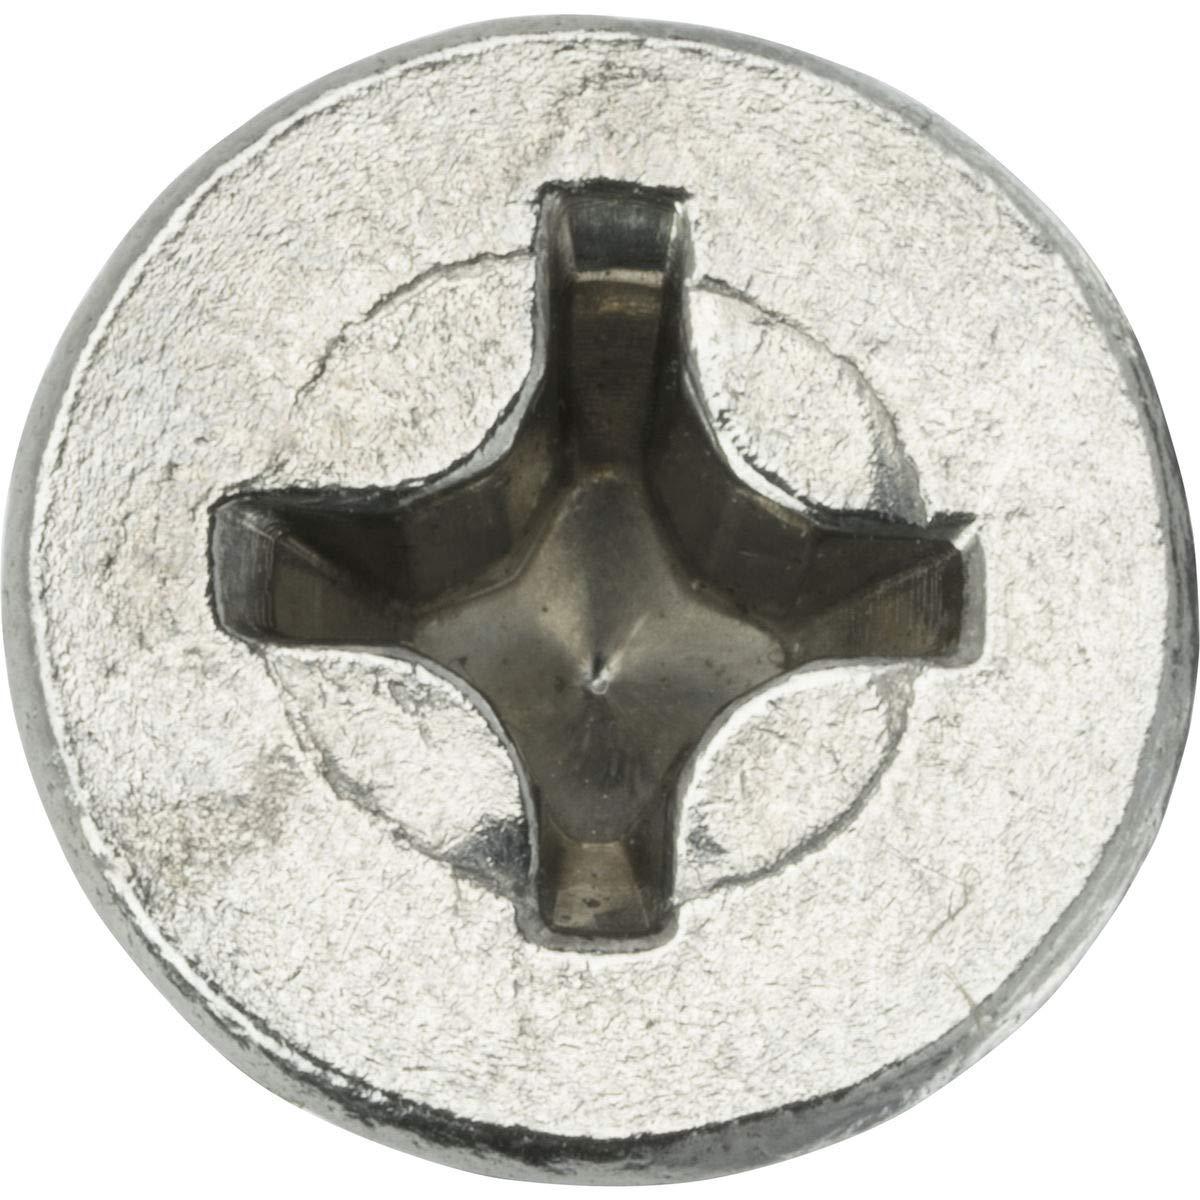 10-24 x 3//8 Flat Head Machine Screws Phillips Drive Stainless Steel Qty 100